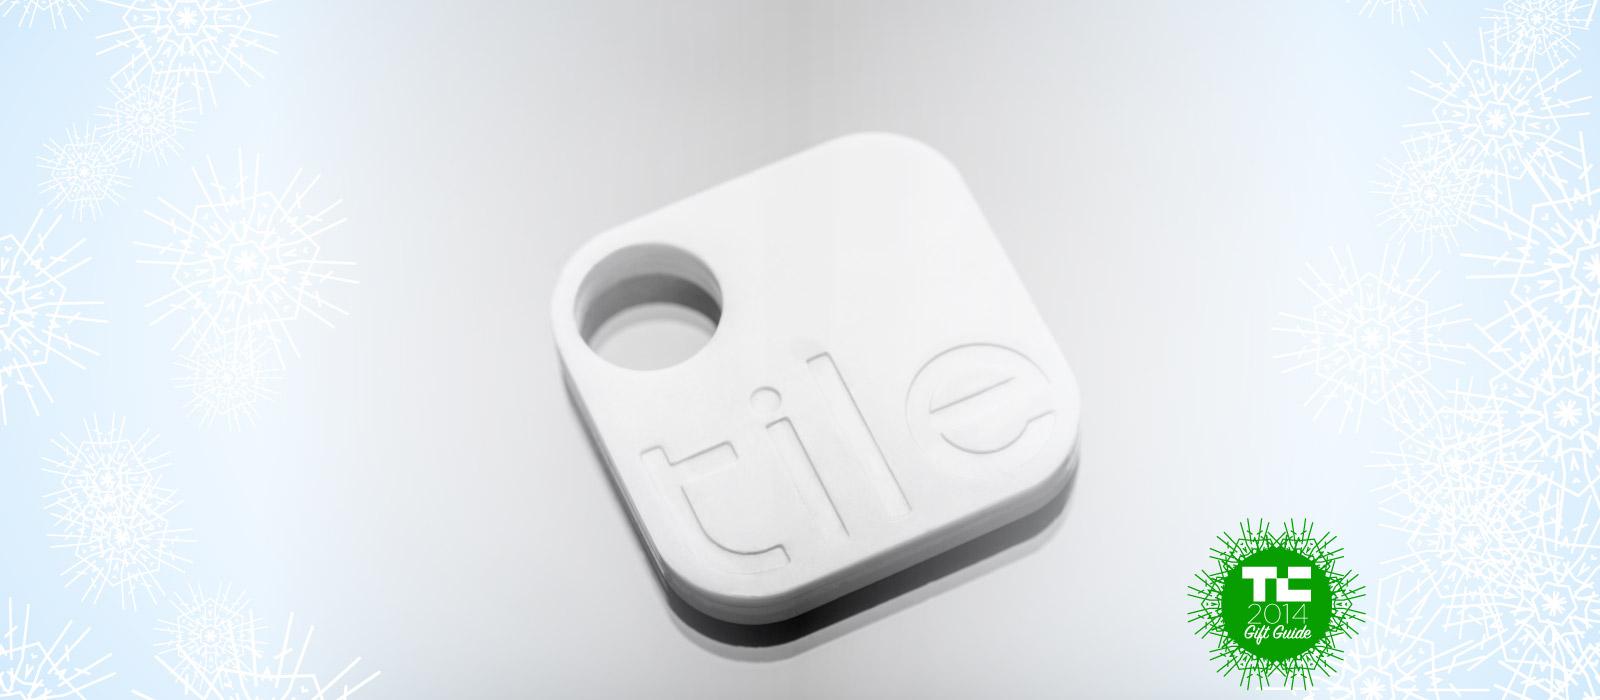 tile-giftguide14